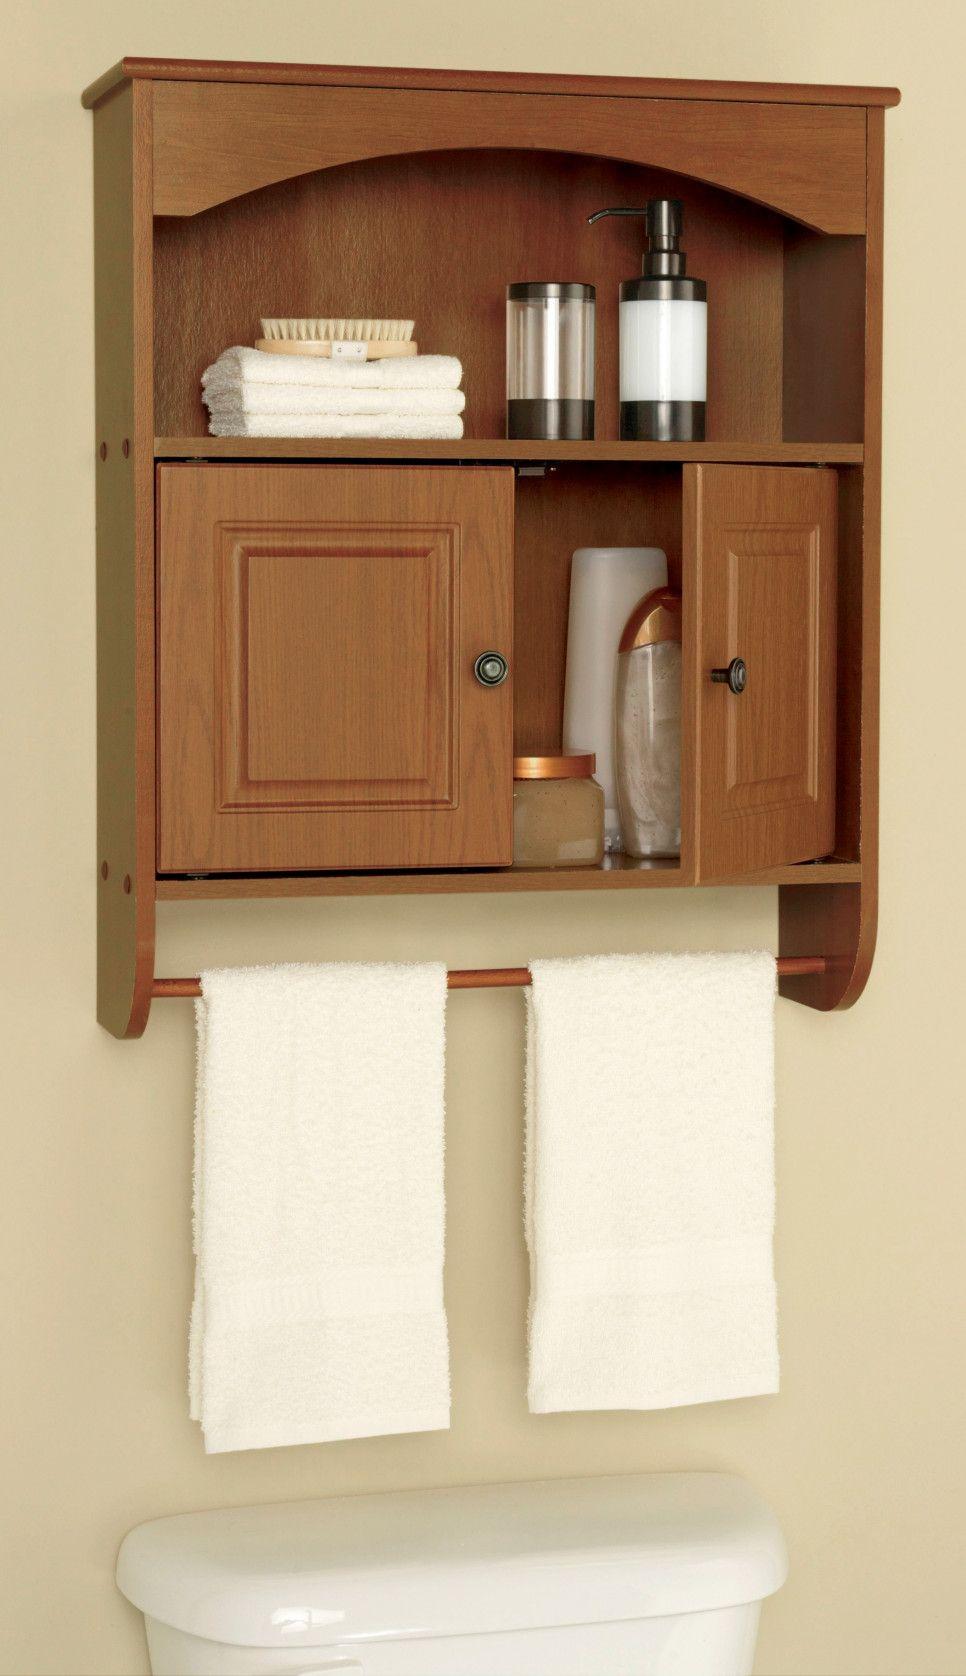 99+ Bathroom Wall Cabinet with towel Bar - Kitchen Decor theme Ideas ...